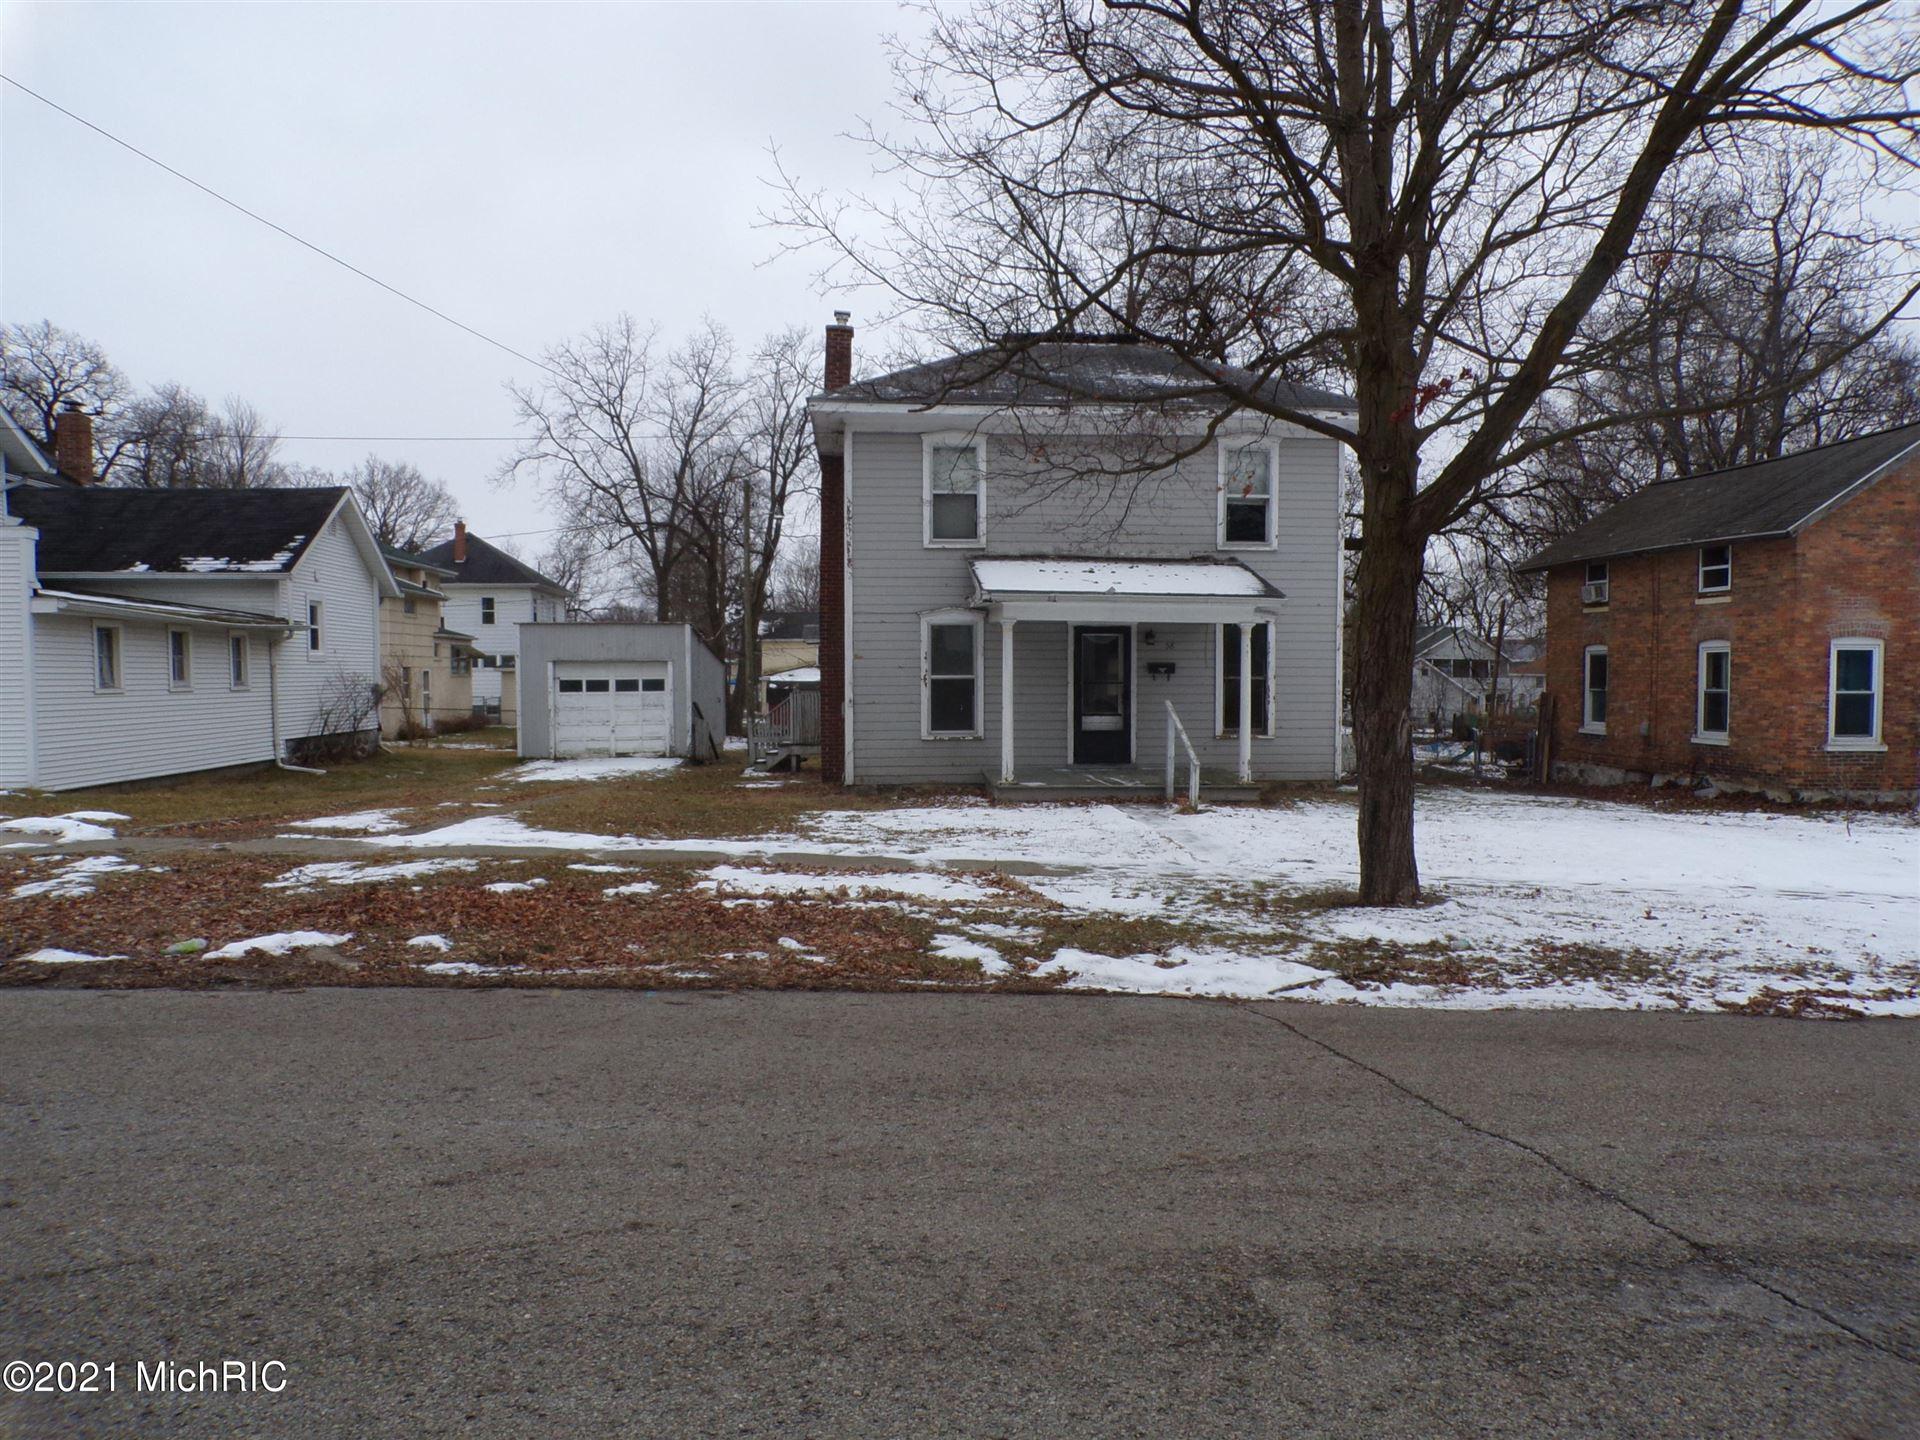 58 Howder Street, Hillsdale, MI 49242 - MLS#: 21003713